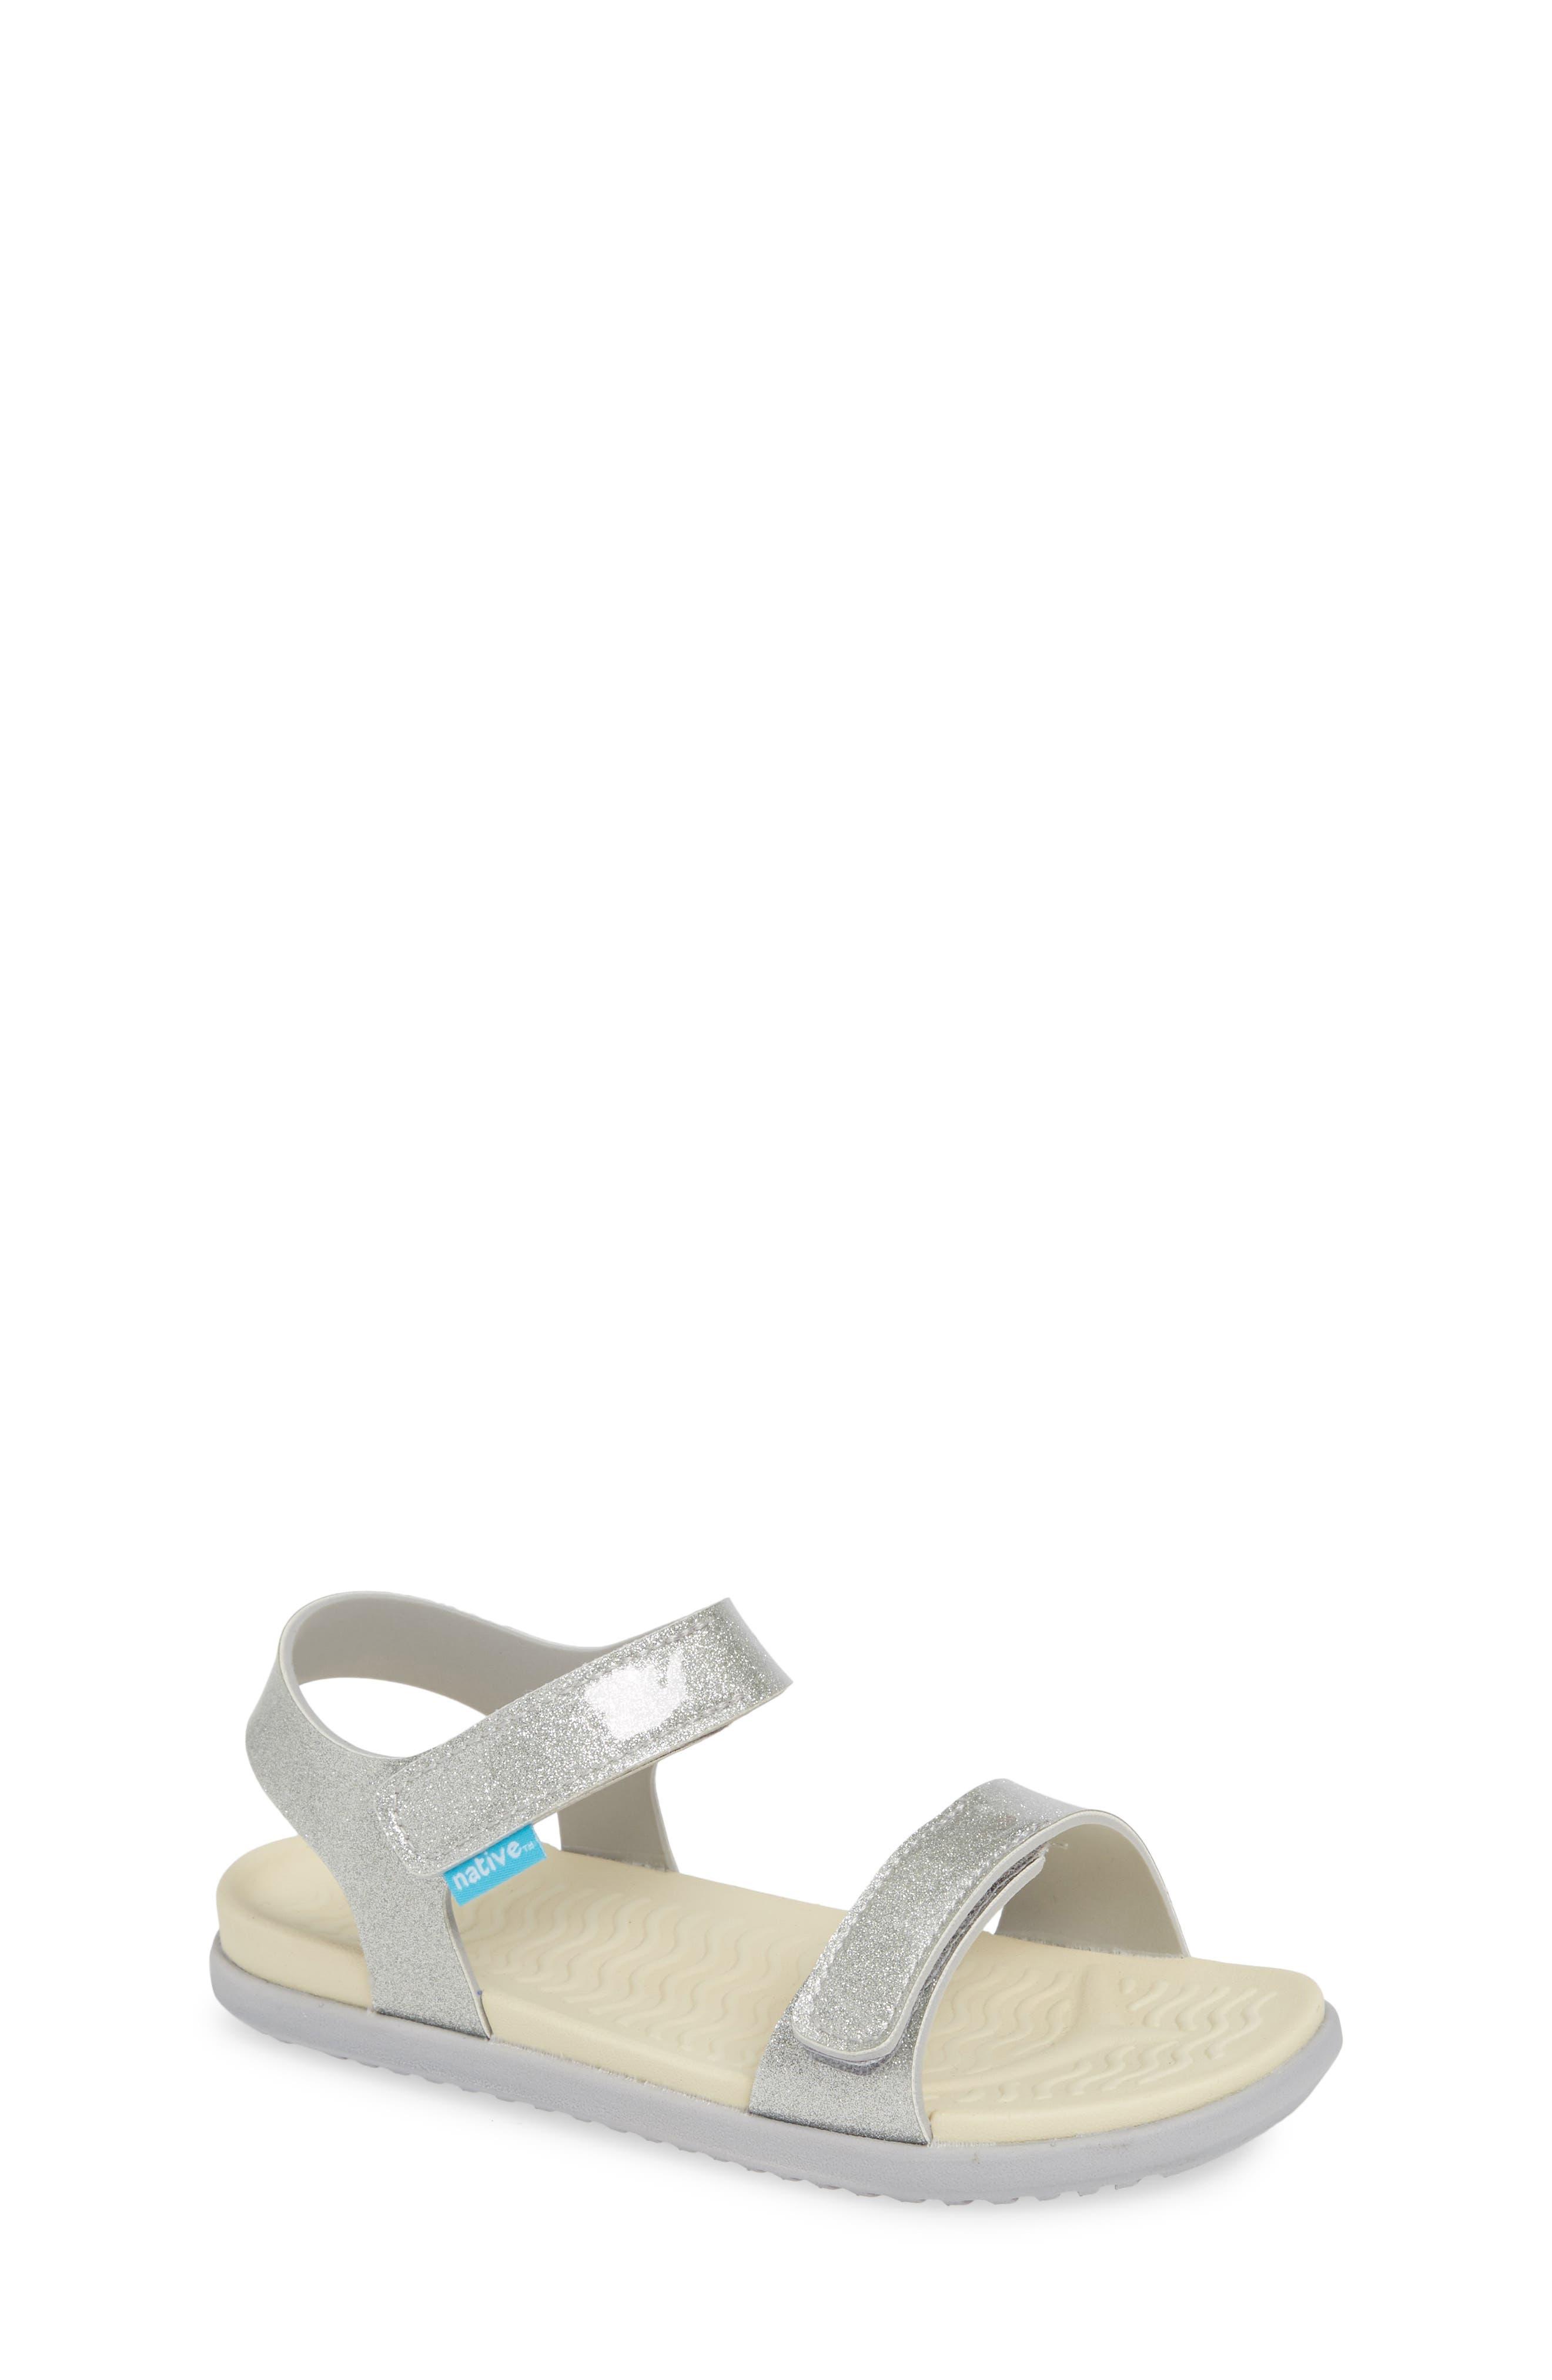 Charley Child Waterproof Flat Vegan Sandal,                             Main thumbnail 1, color,                             SILVER GLITTER/ WHITE/ GREY